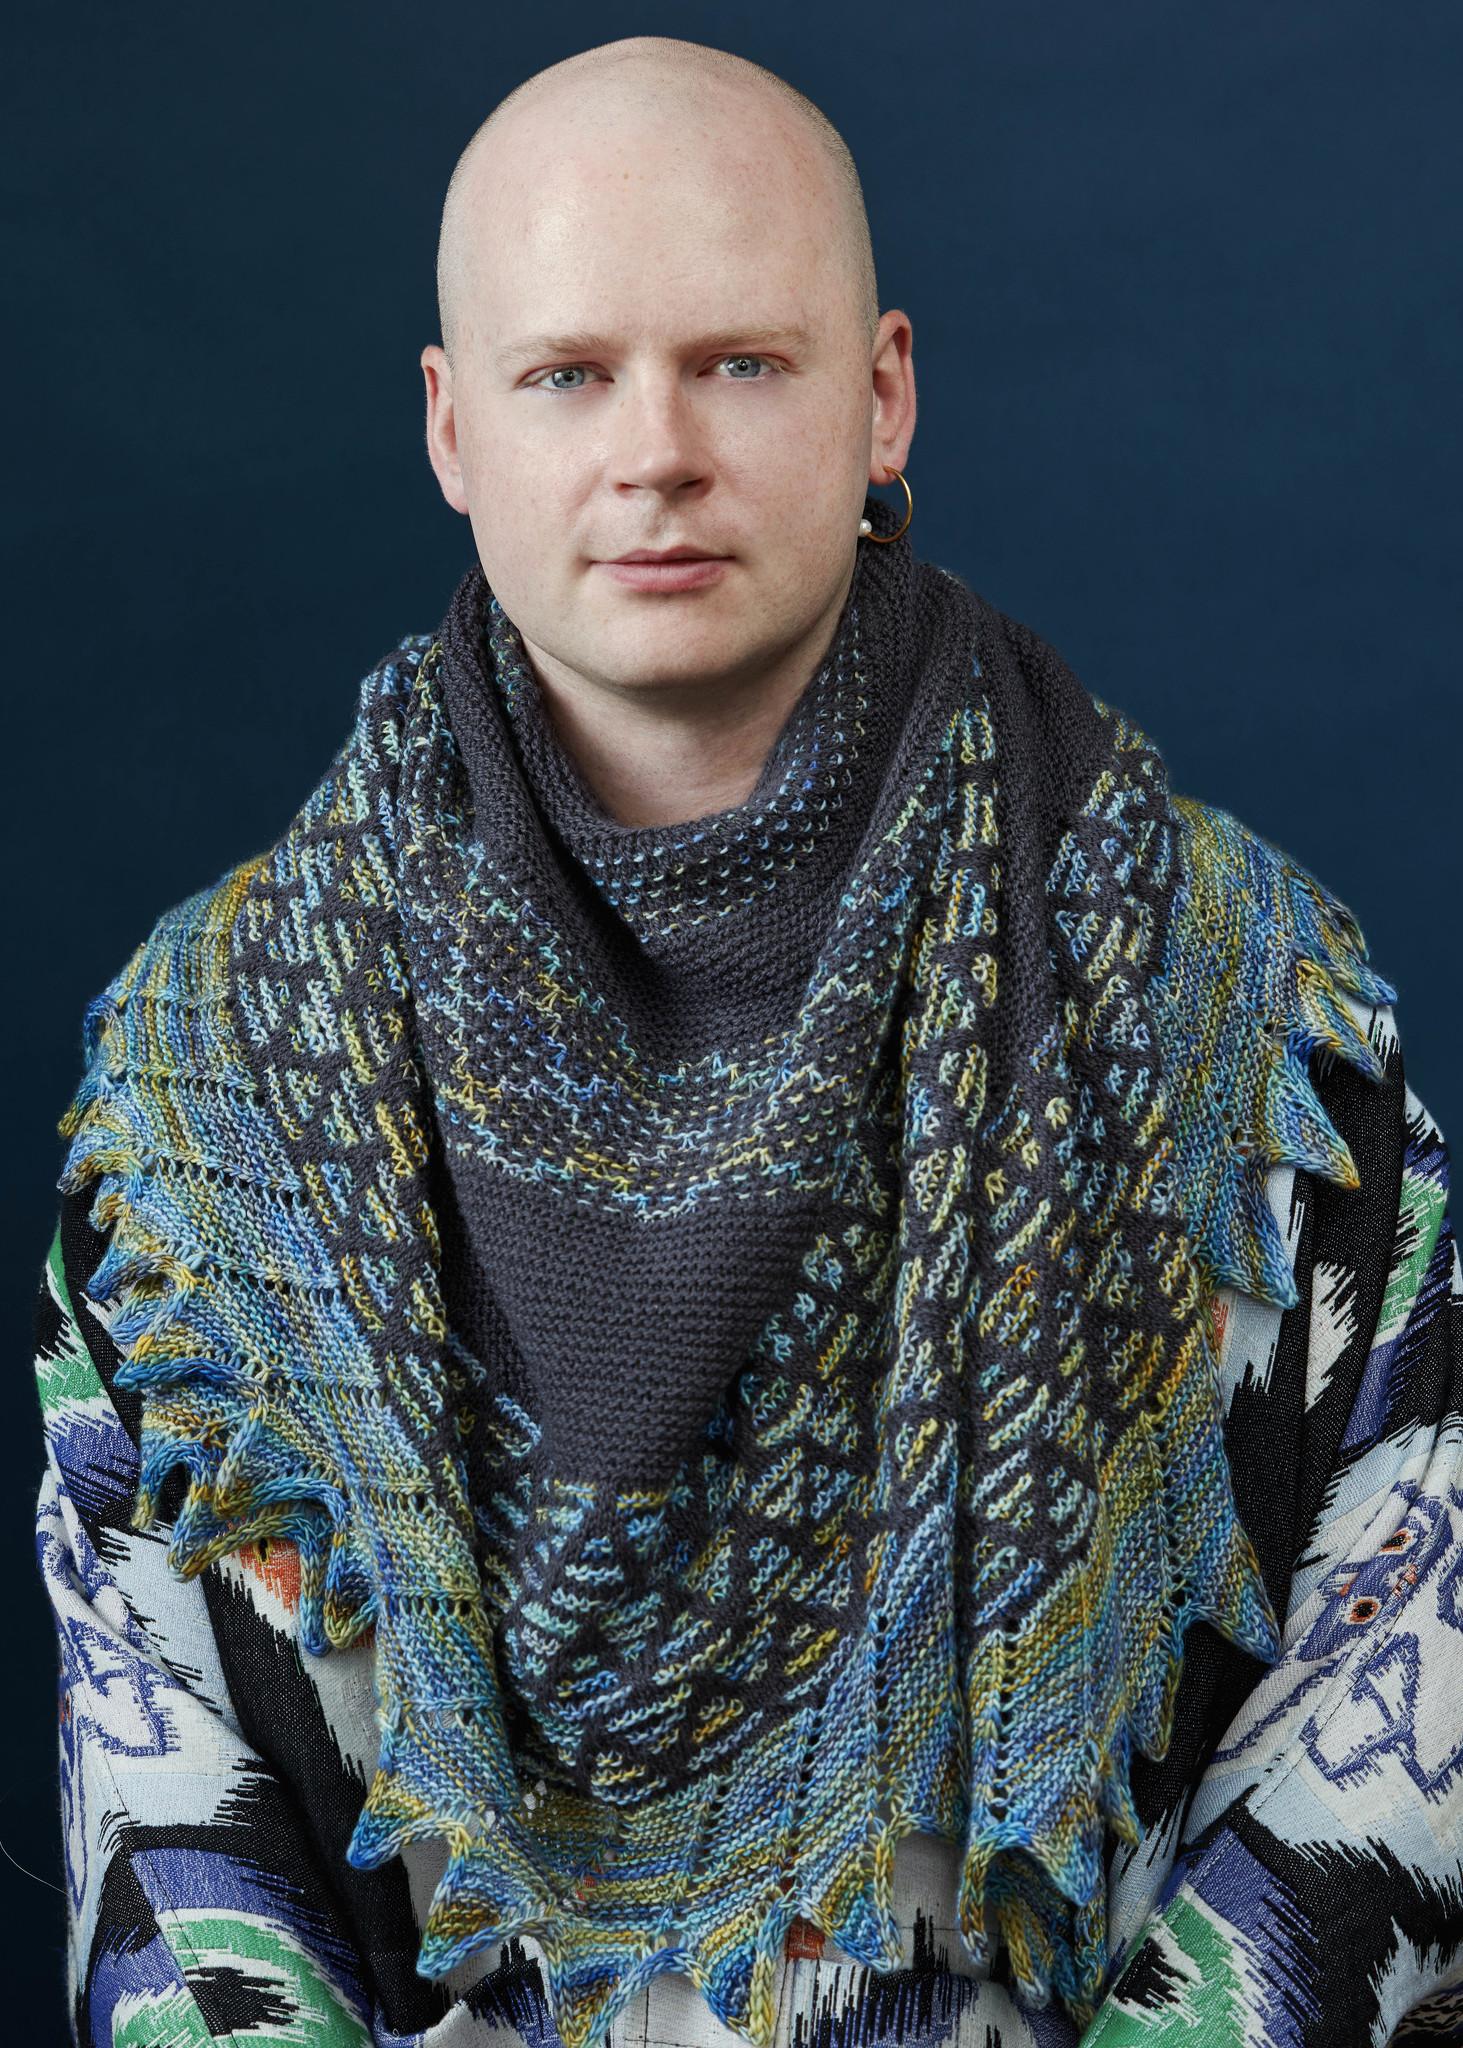 Westknits WESTKNITS KIT MOSAIC MUSINGS - GOLD 2